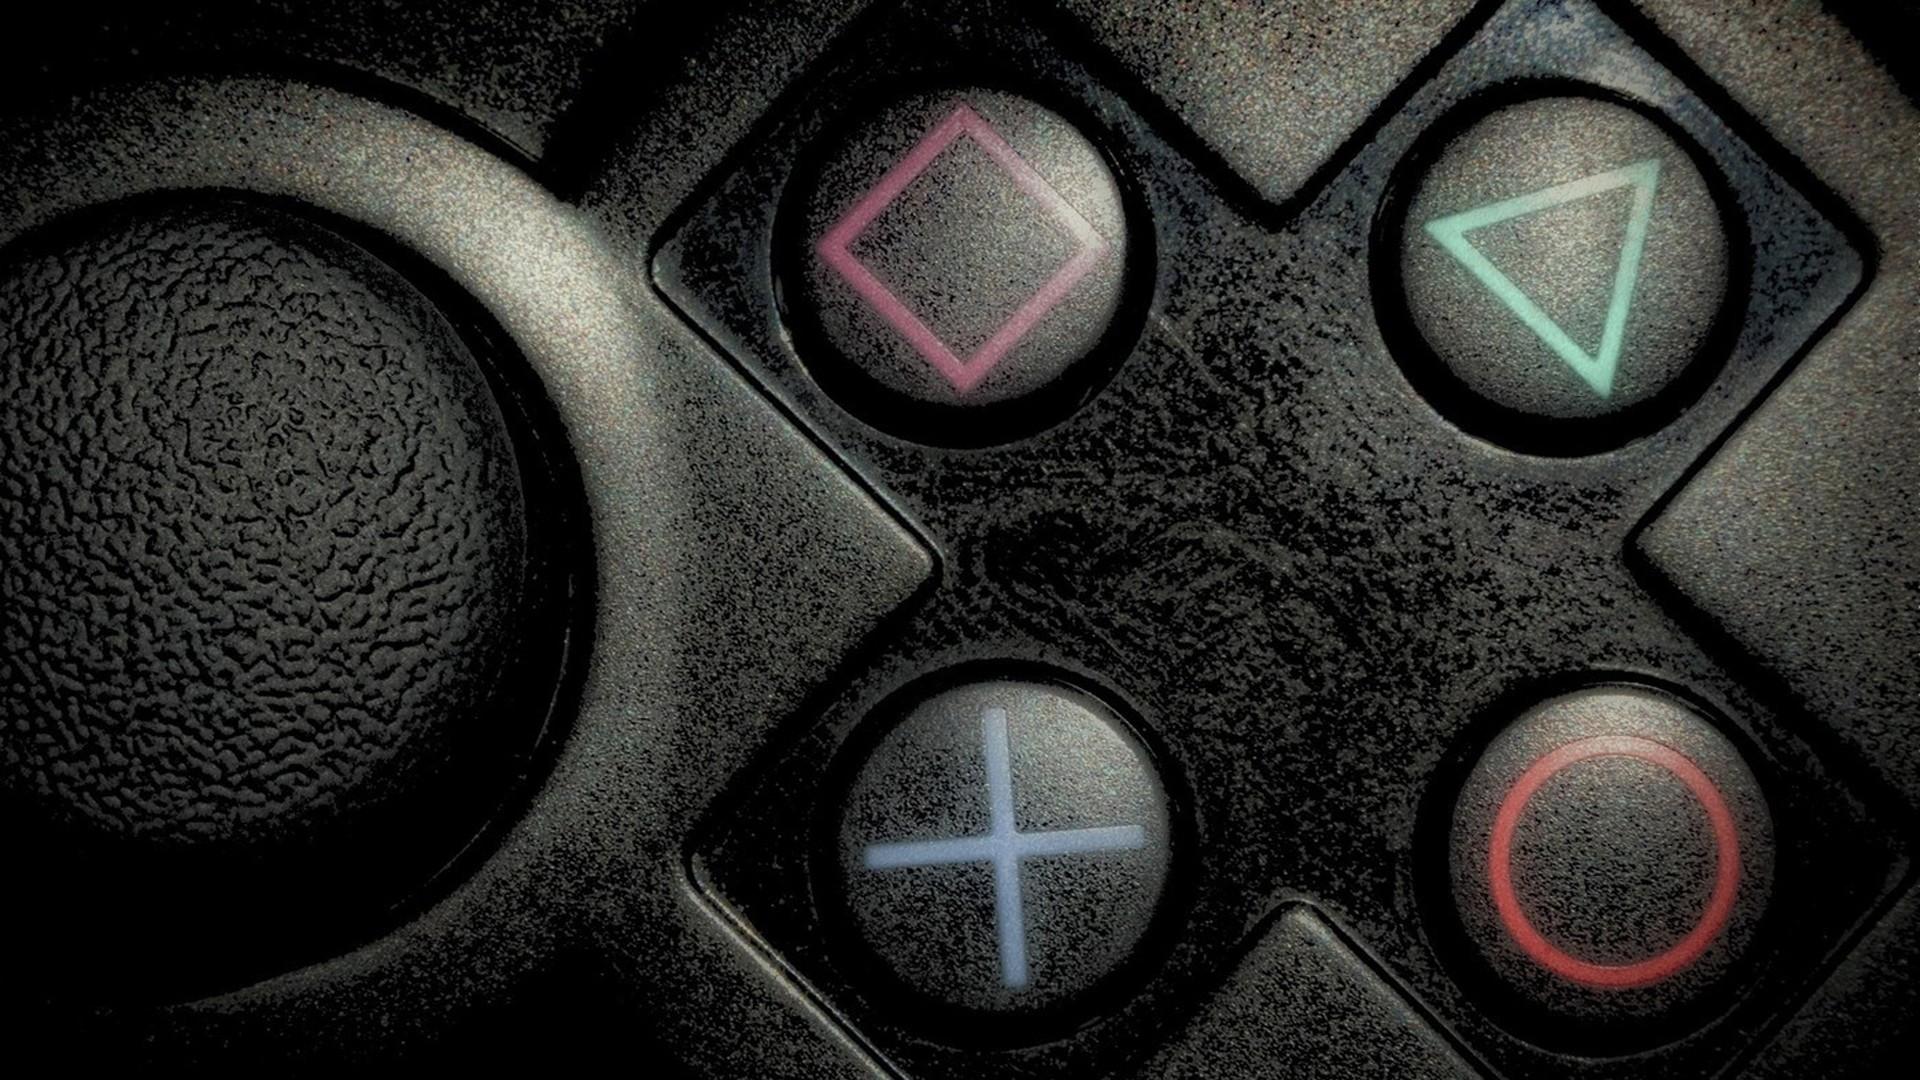 lantern Wallpaper, Playstation 3 Wallpapers, Games Desktop Wallpapers .